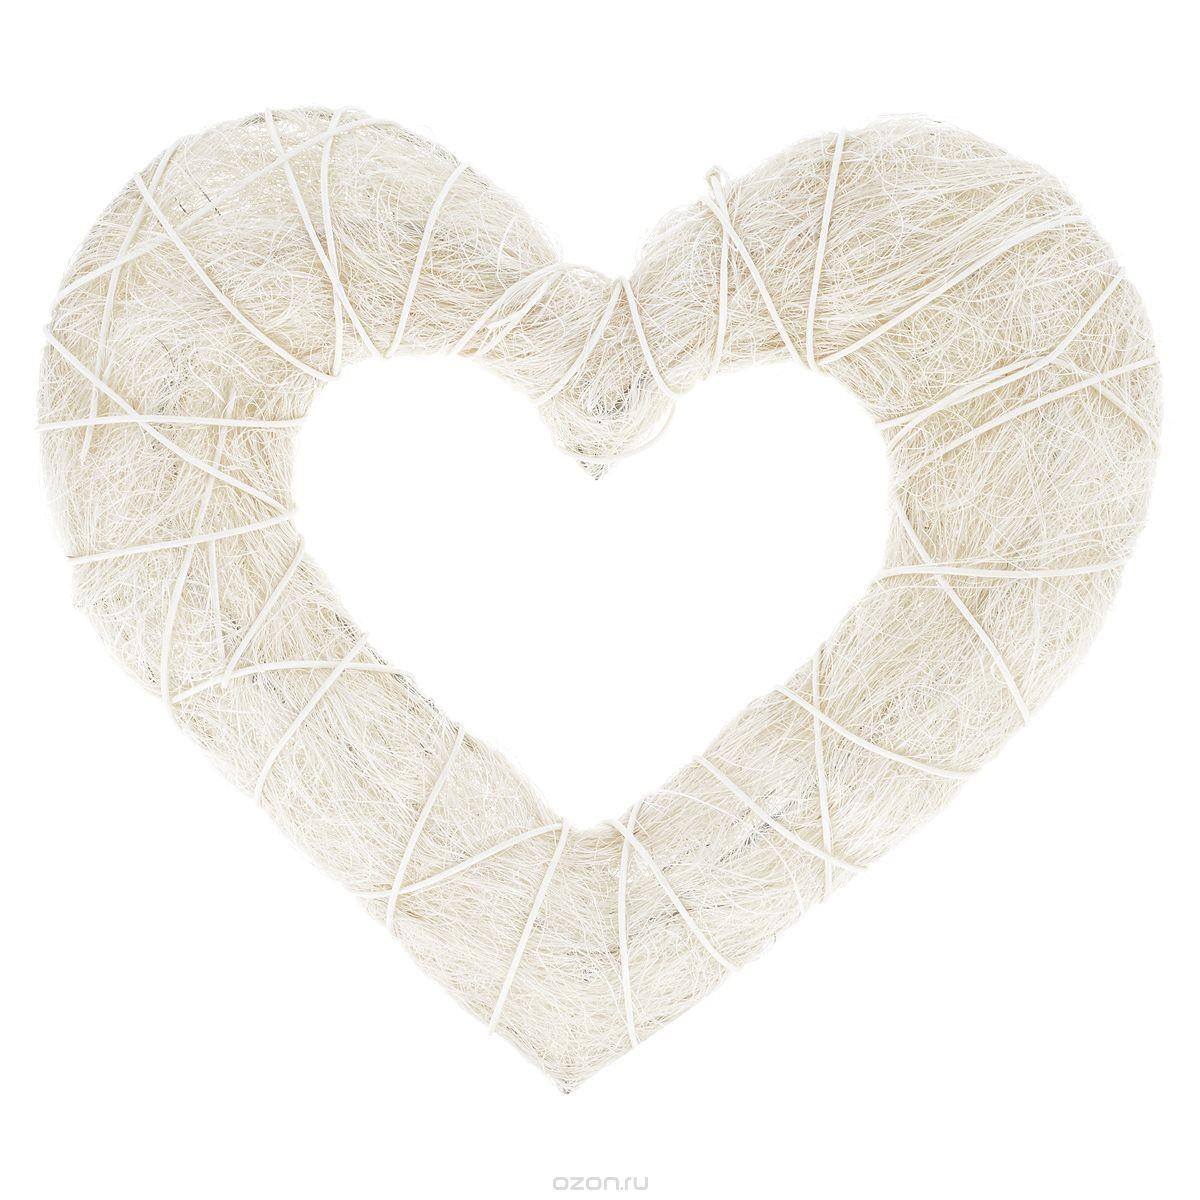 Декоративный венок-заготовка ScrapBerry's Сердце